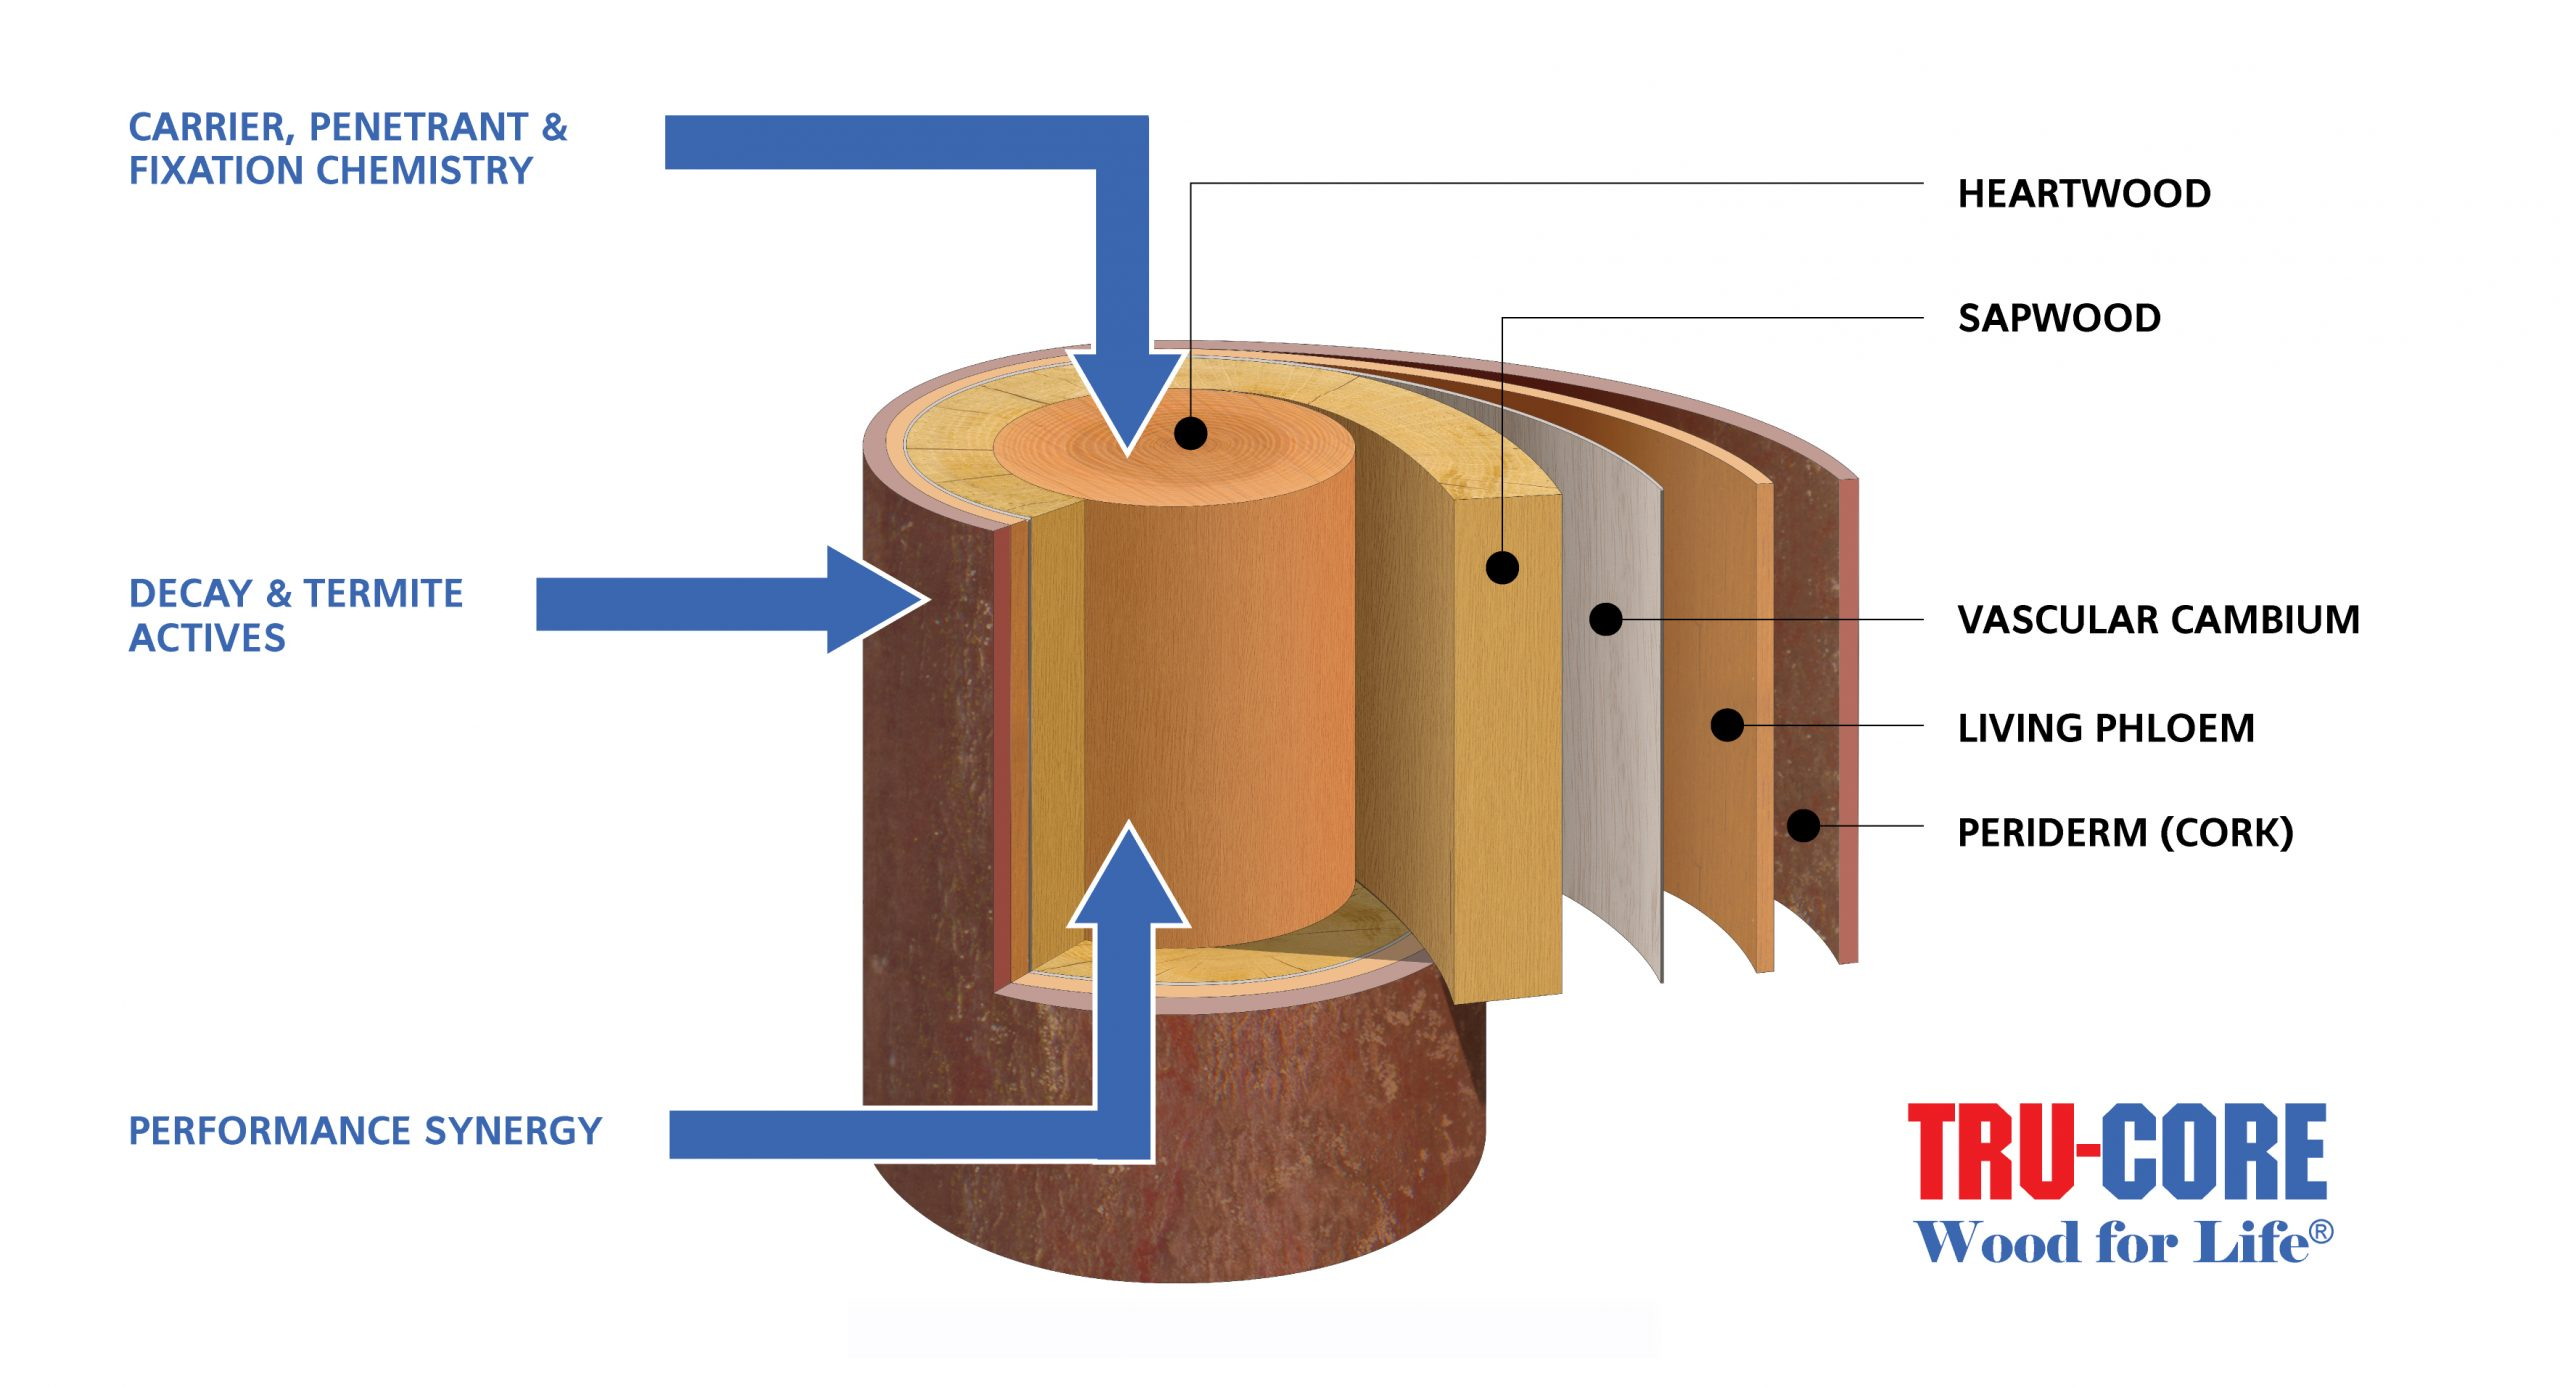 Tru-core-timber treatment Fishers Timber